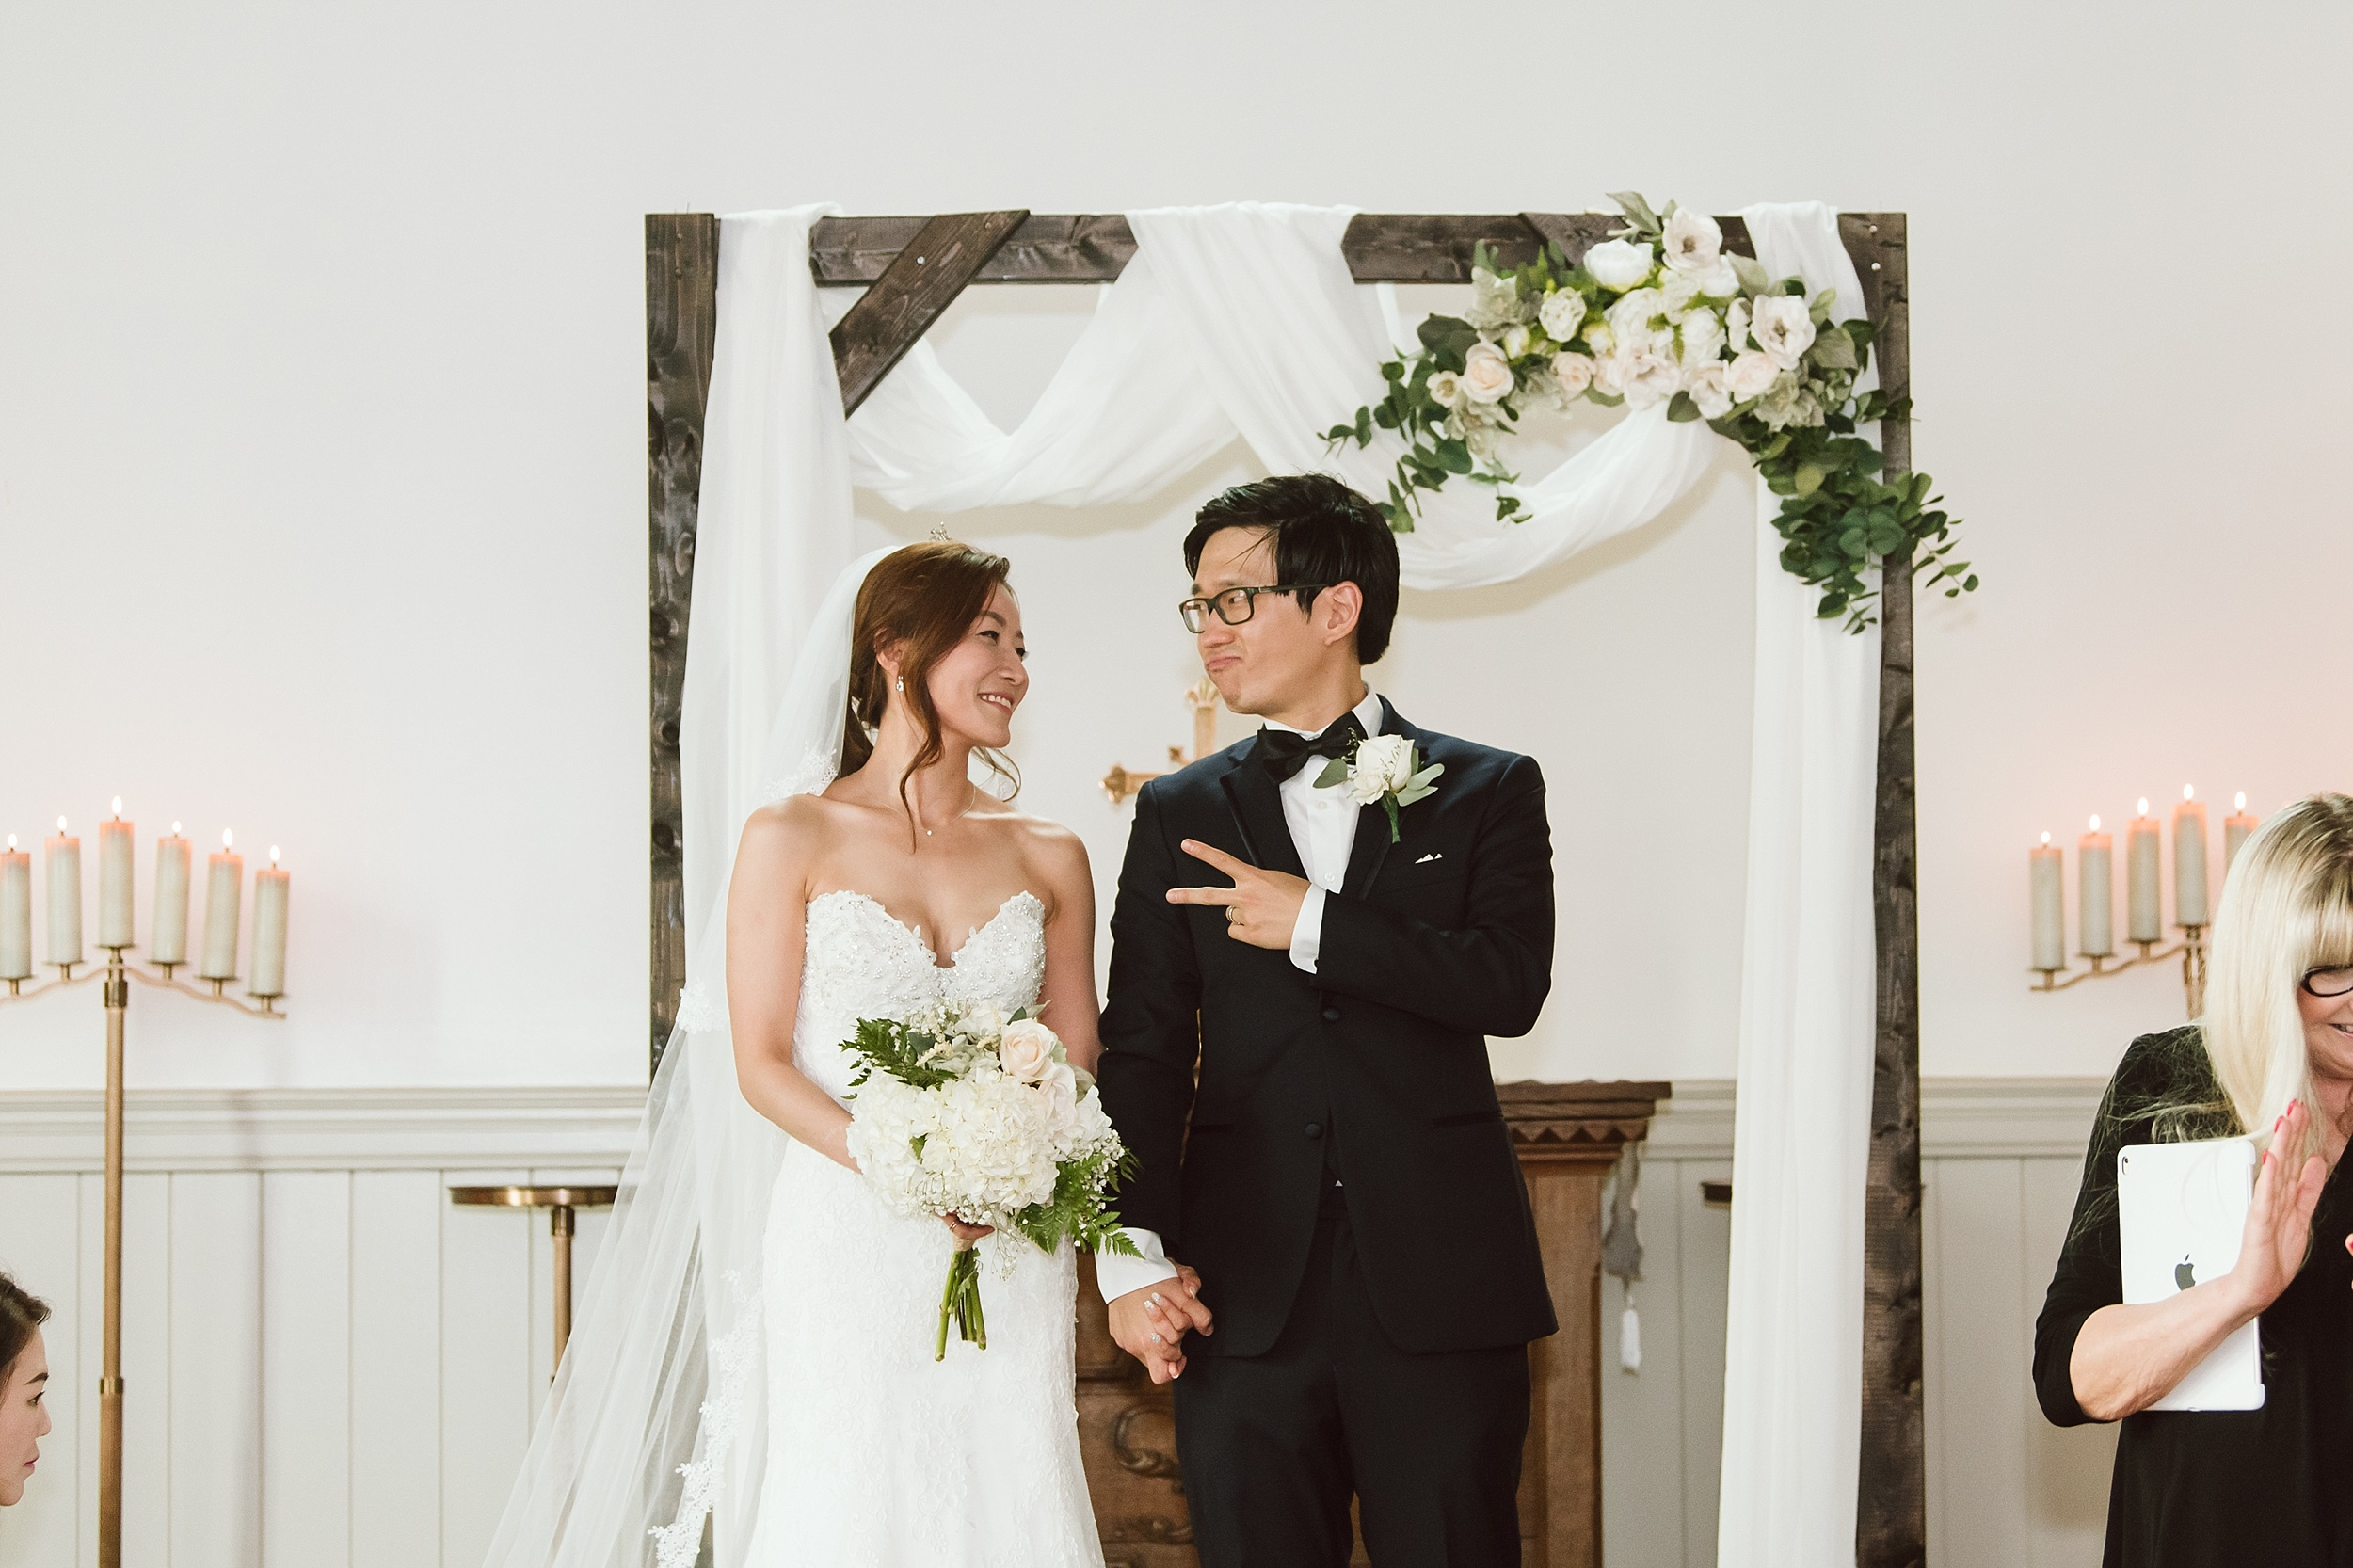 Doctors_House_Kleinburg_Wedding_Toronto_Photographer_0027.jpg